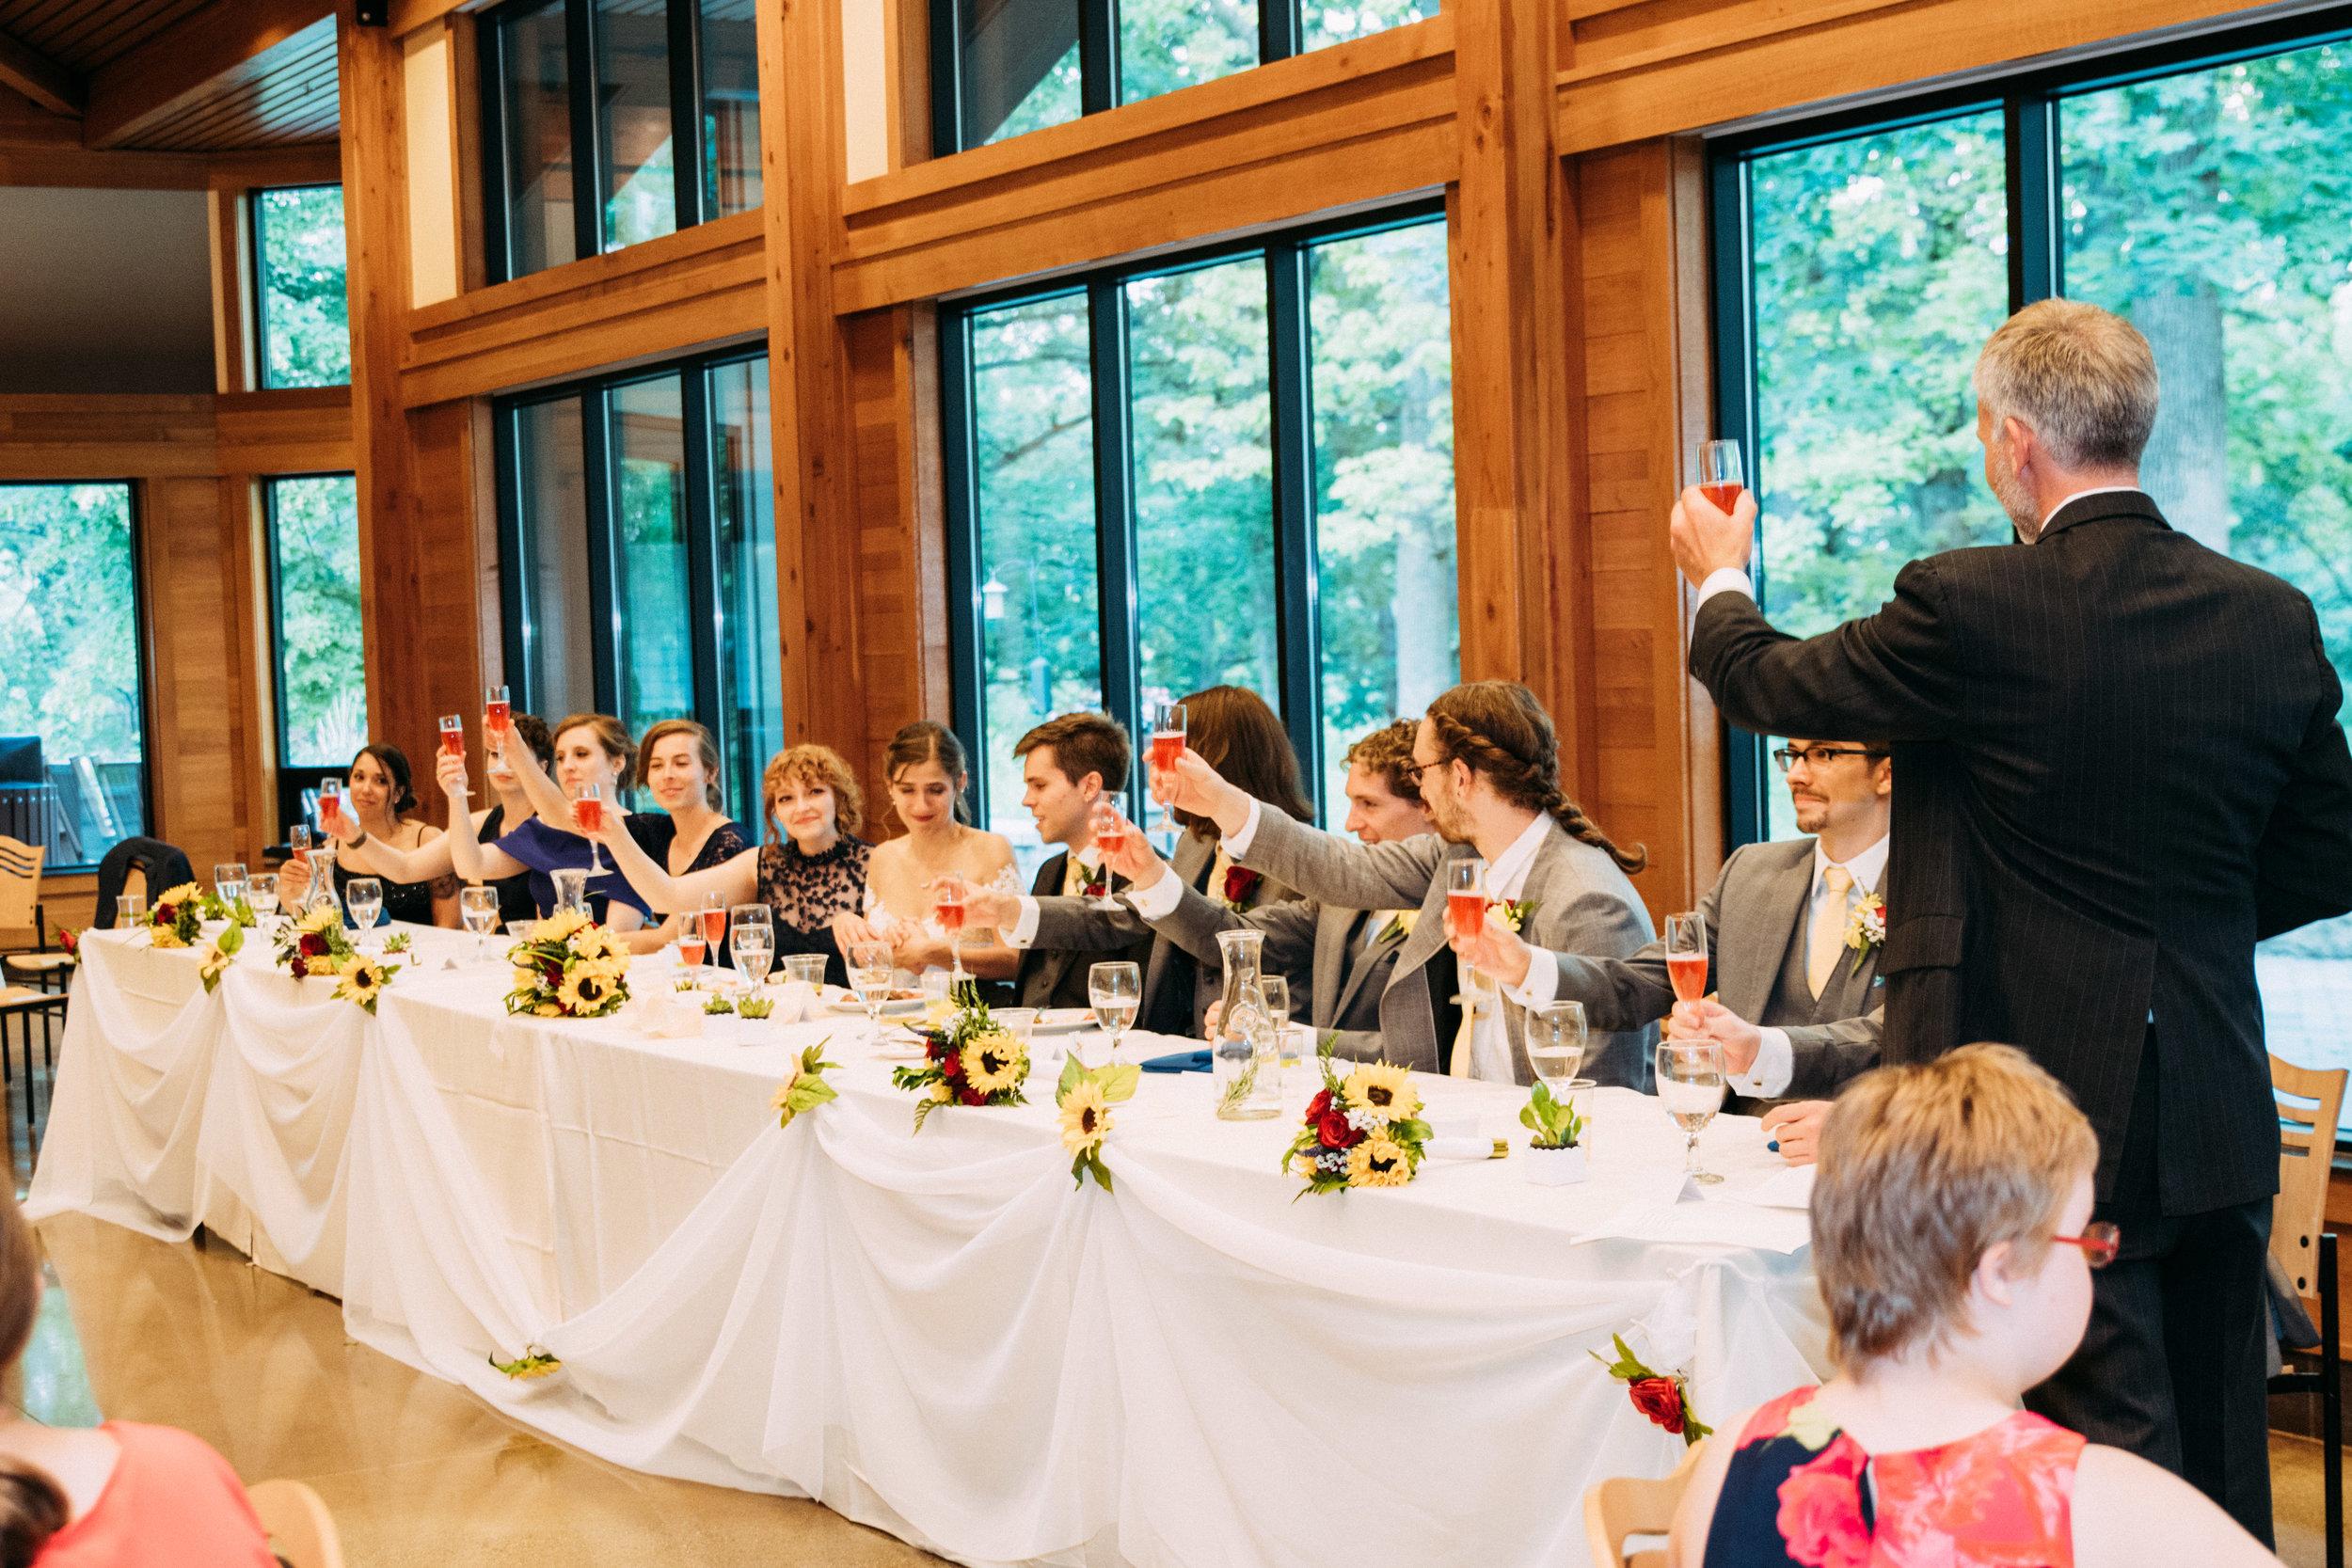 39-Liza_Chris_Minneapolis_Minnesota_Wedding.jpg